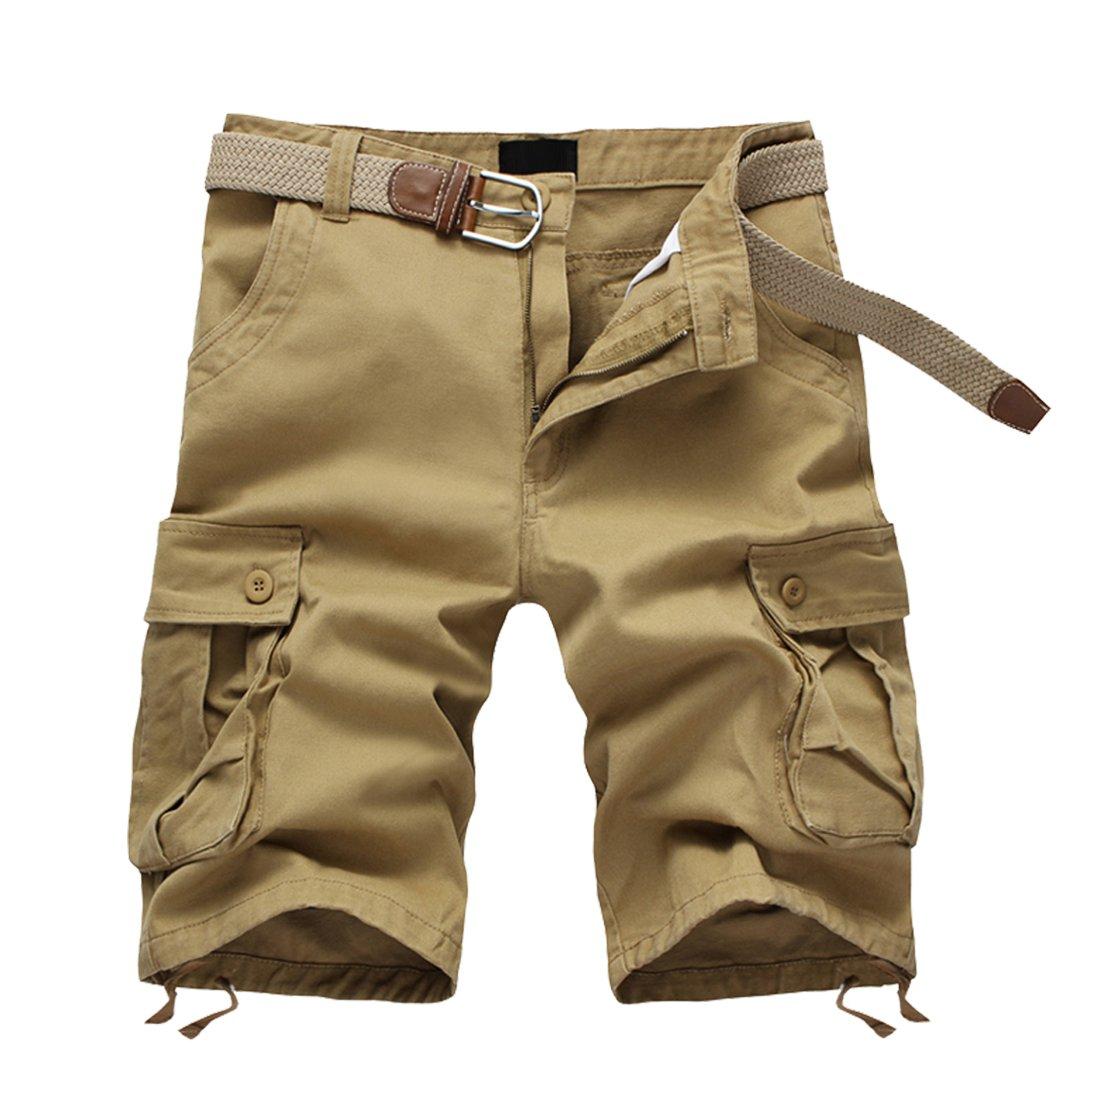 DR. MAのGOTEK Cotton Casual Mens Cargo Shorts Pants Summer Fashion Sports Beach Travel Pockets Camouflage Shorts (Khaki, 42)